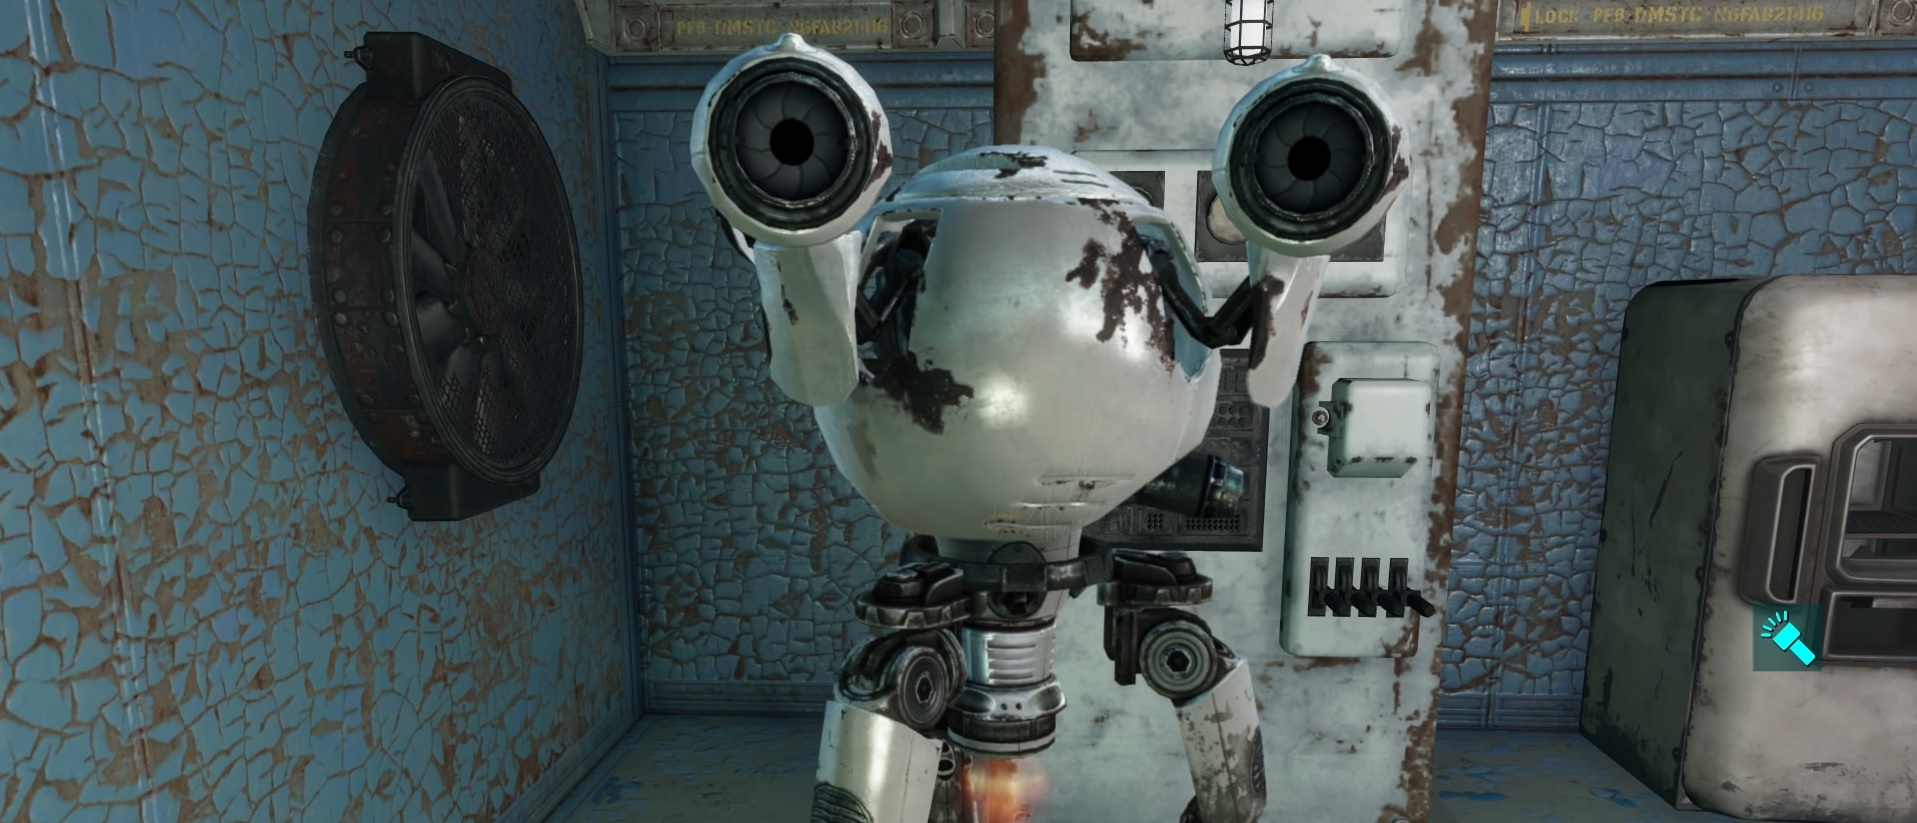 fallout 4 команда удалить объект